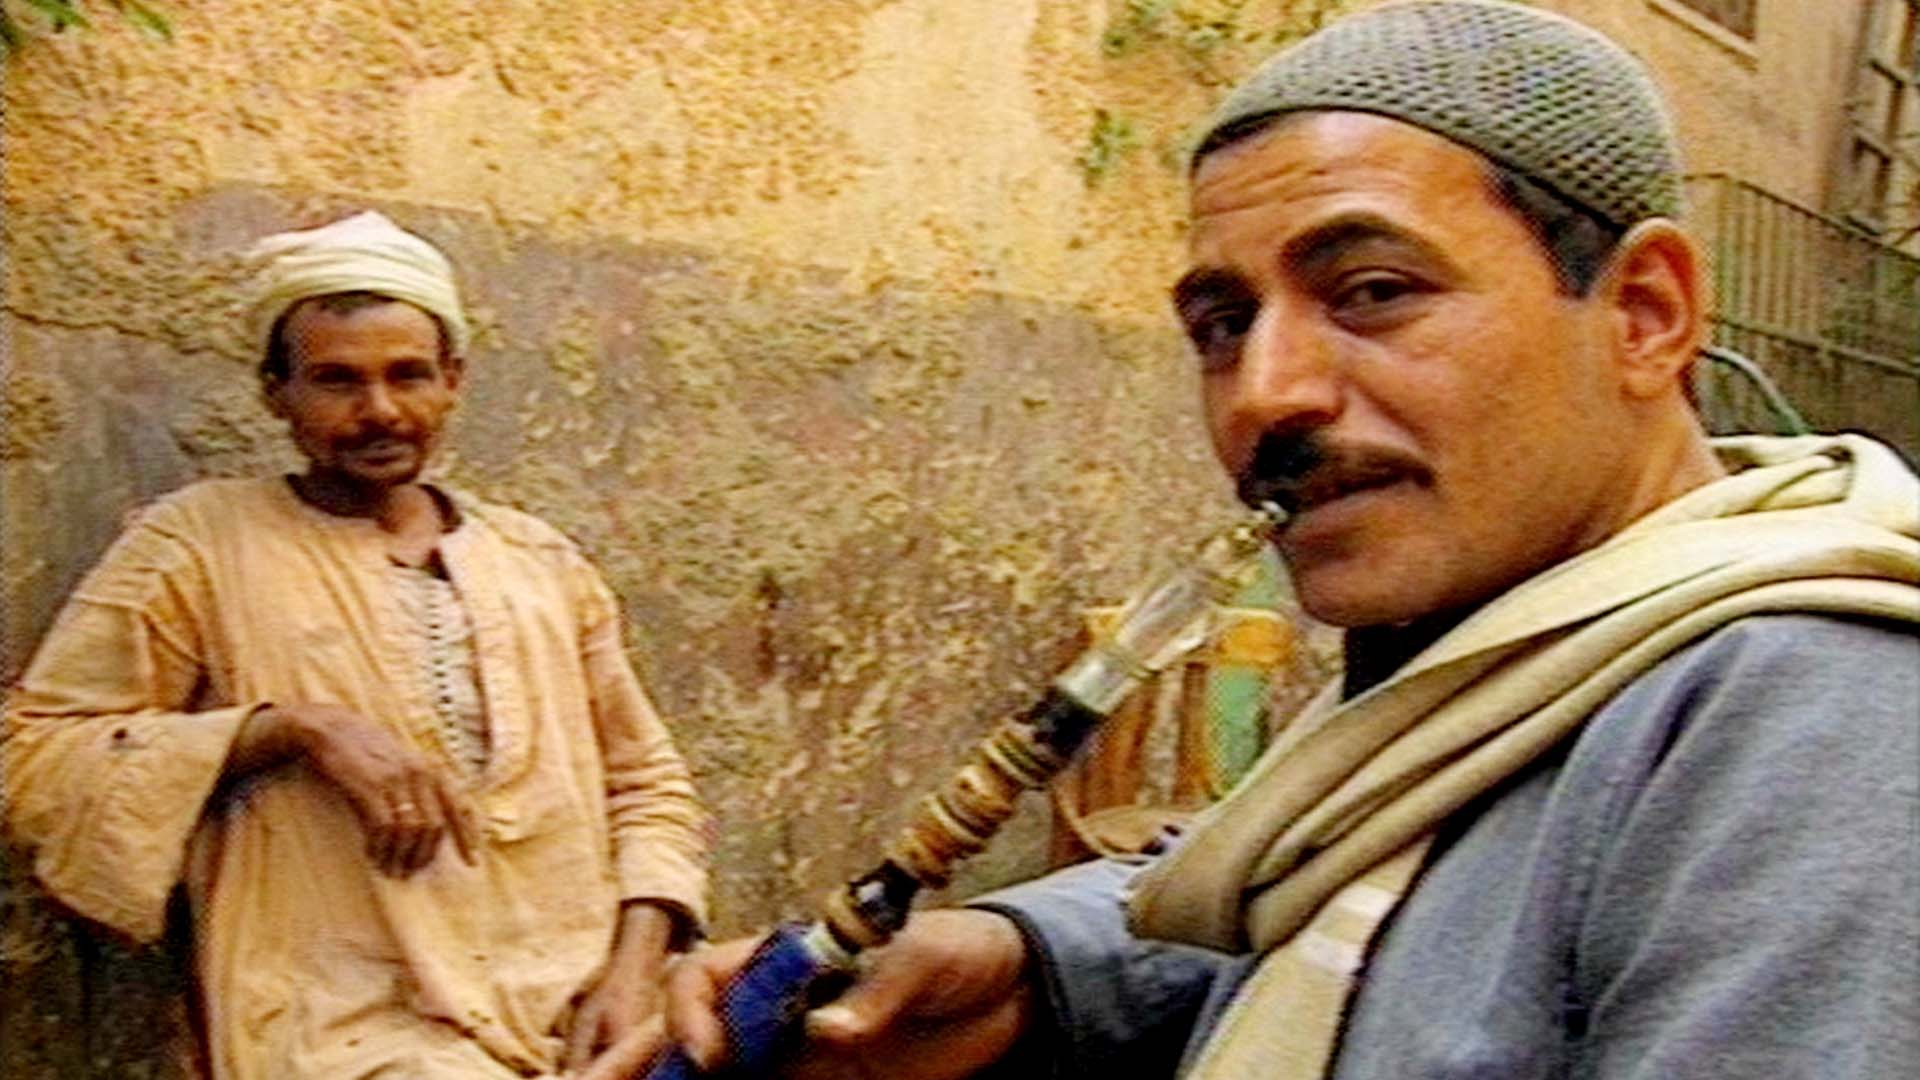 arab man smokes